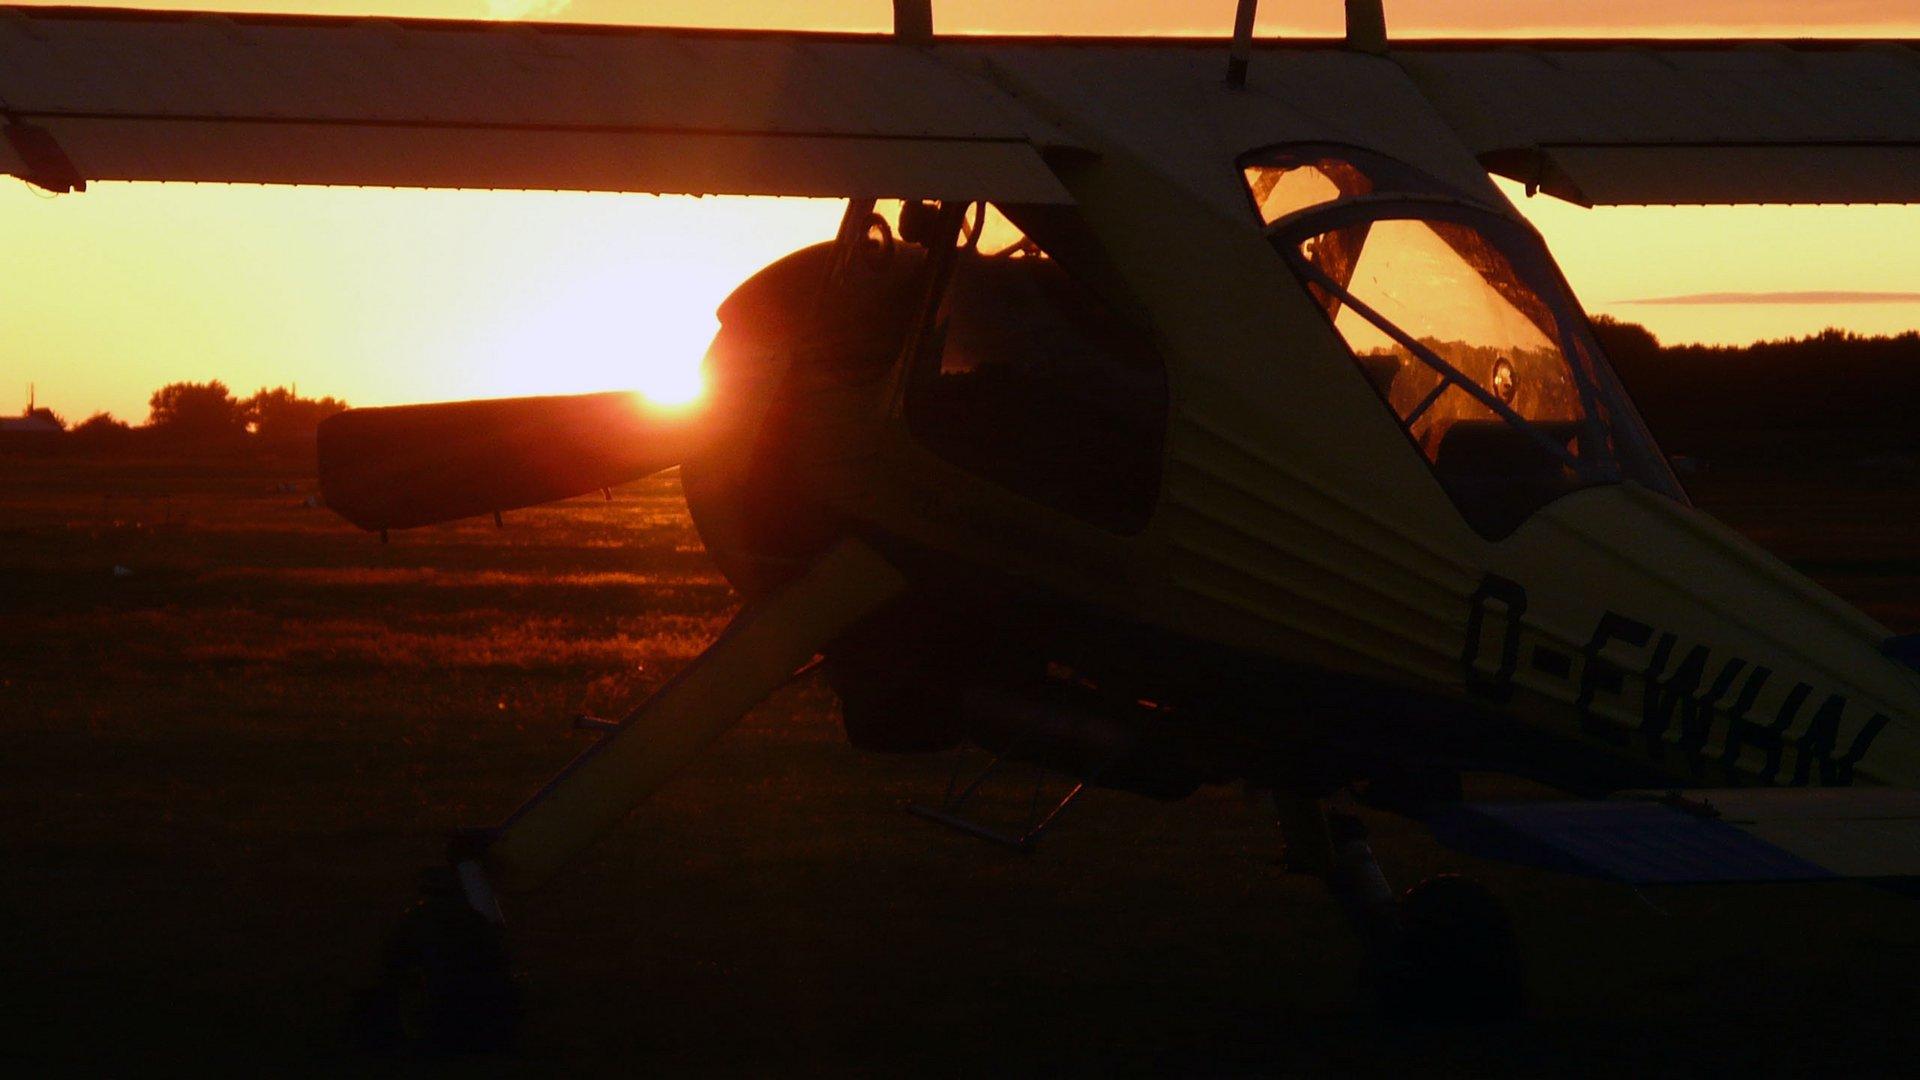 Wilga PZL-104 im Sonnenuntergang